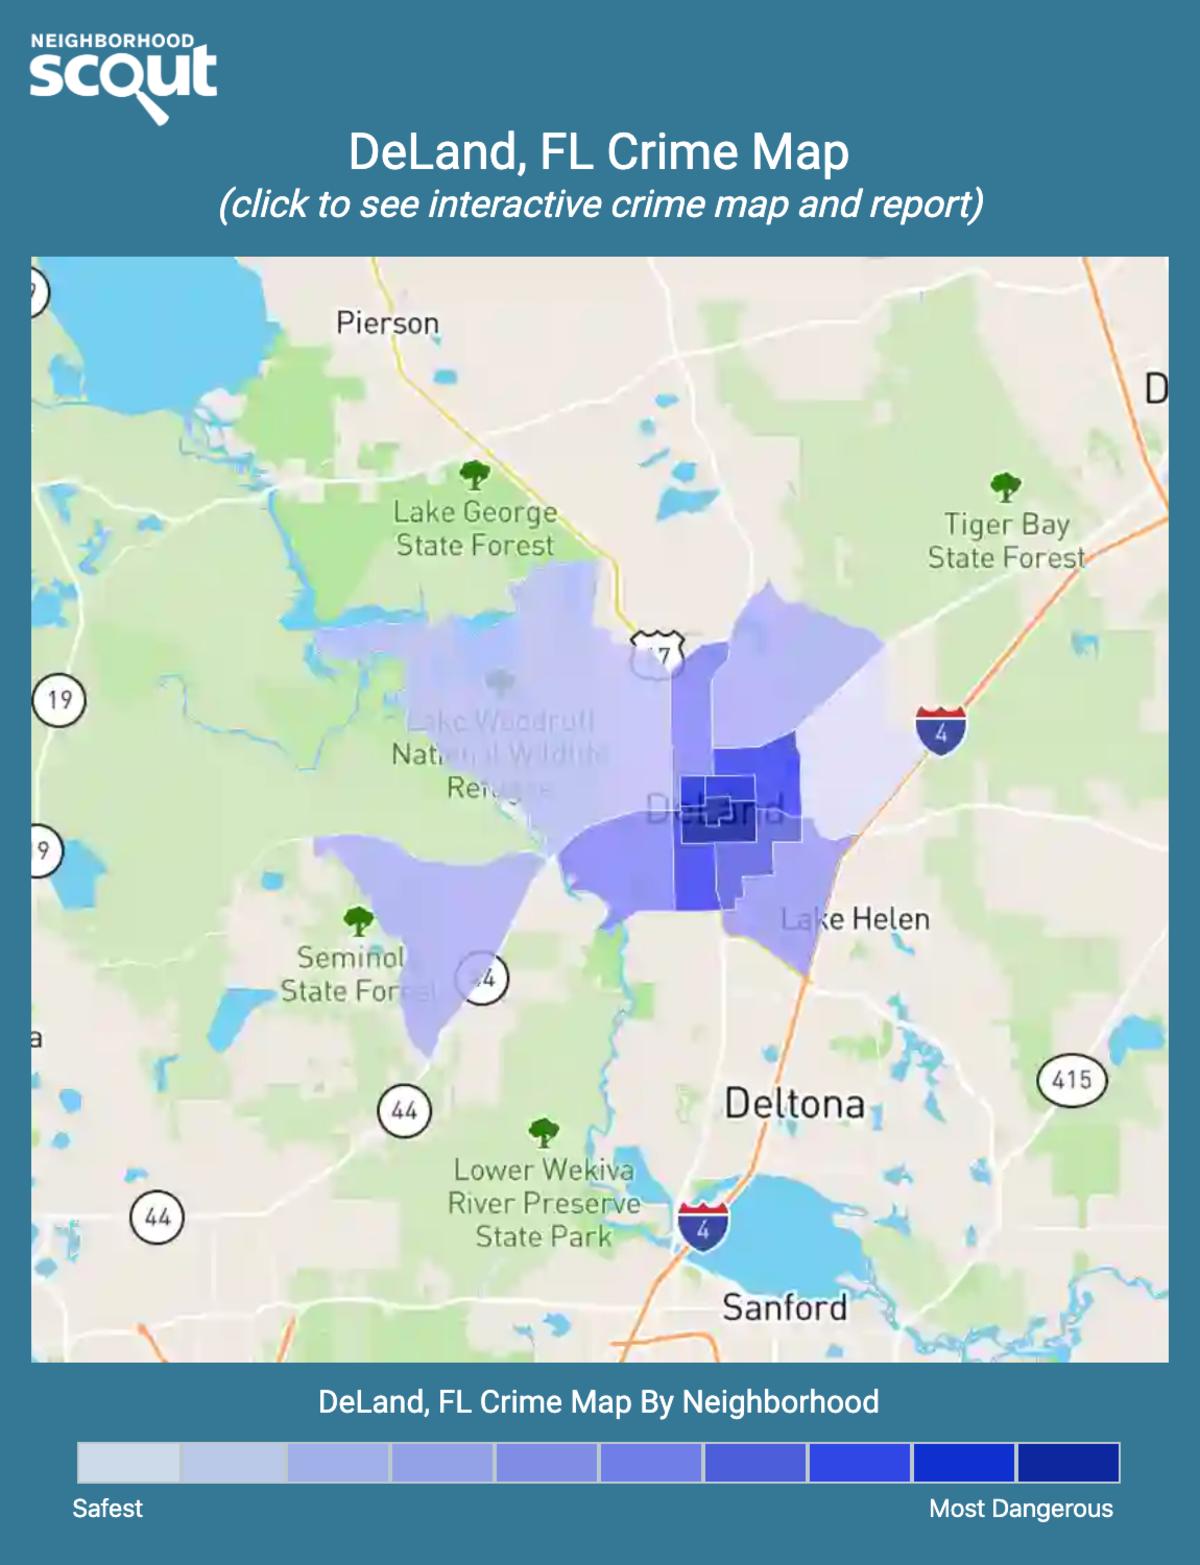 DeLand, Florida crime map